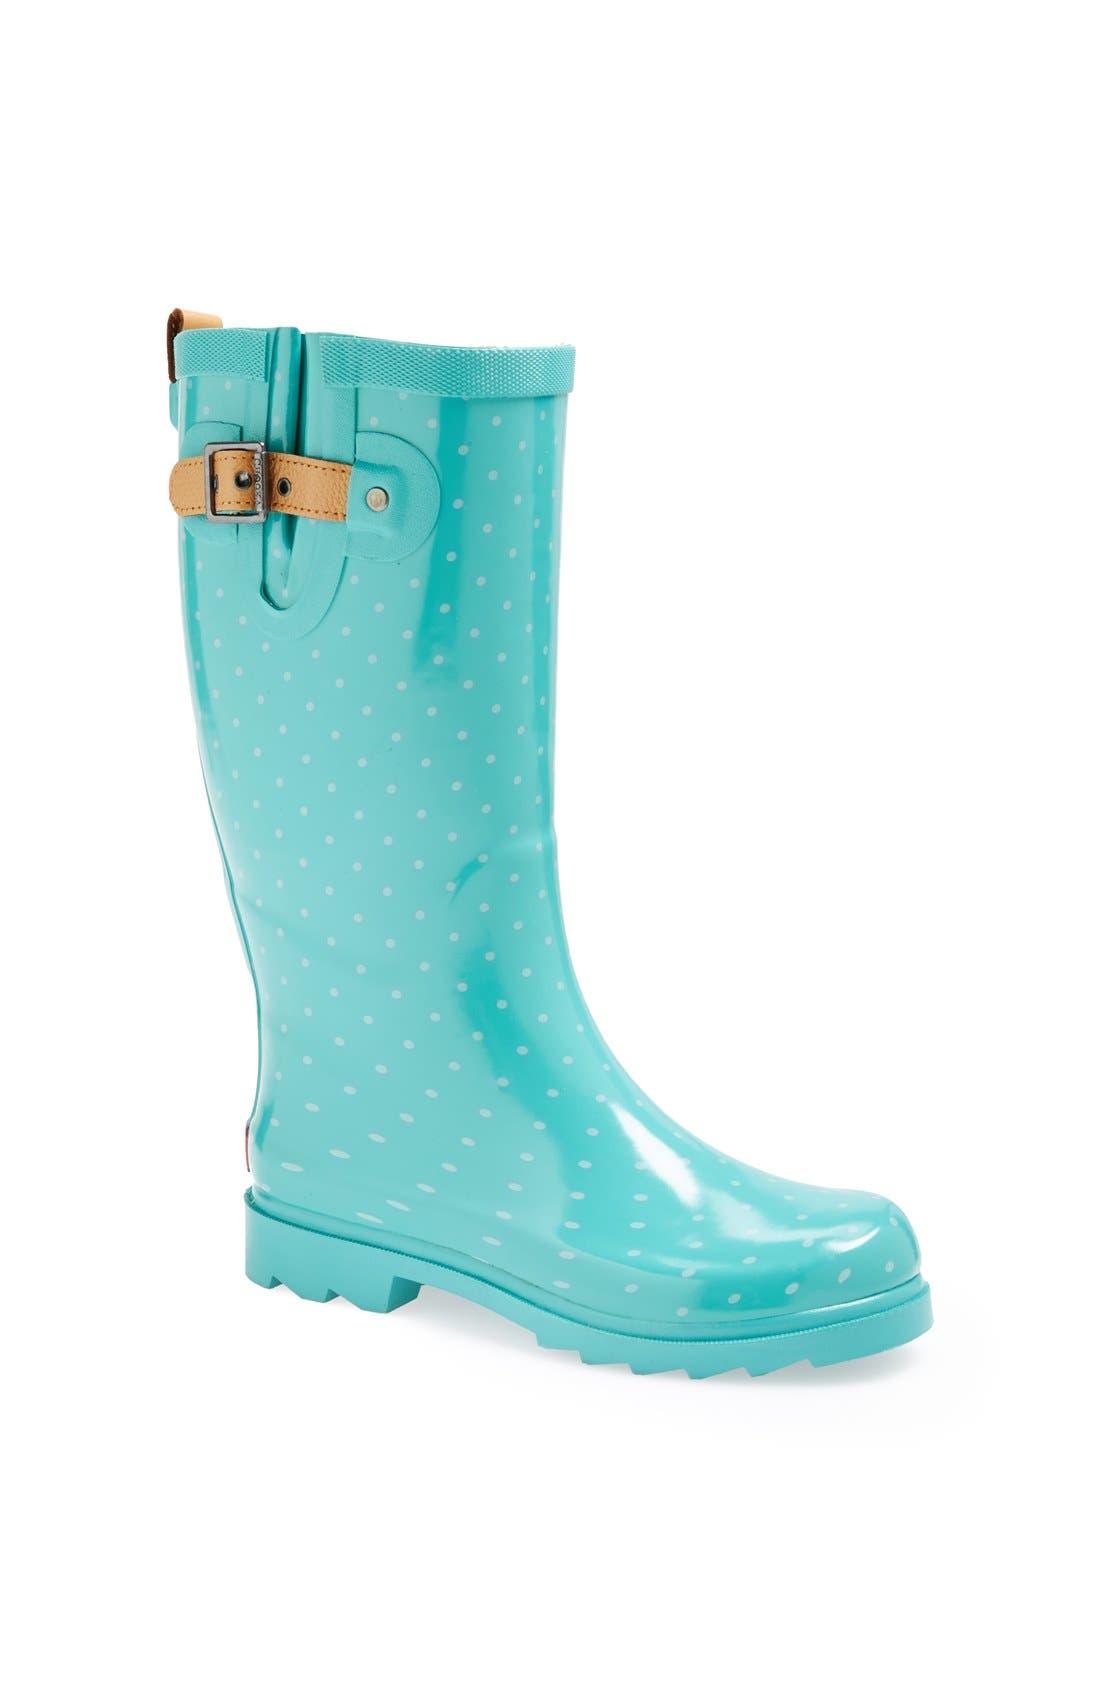 Main Image - Chooka 'Posh Dot' Rain Boot